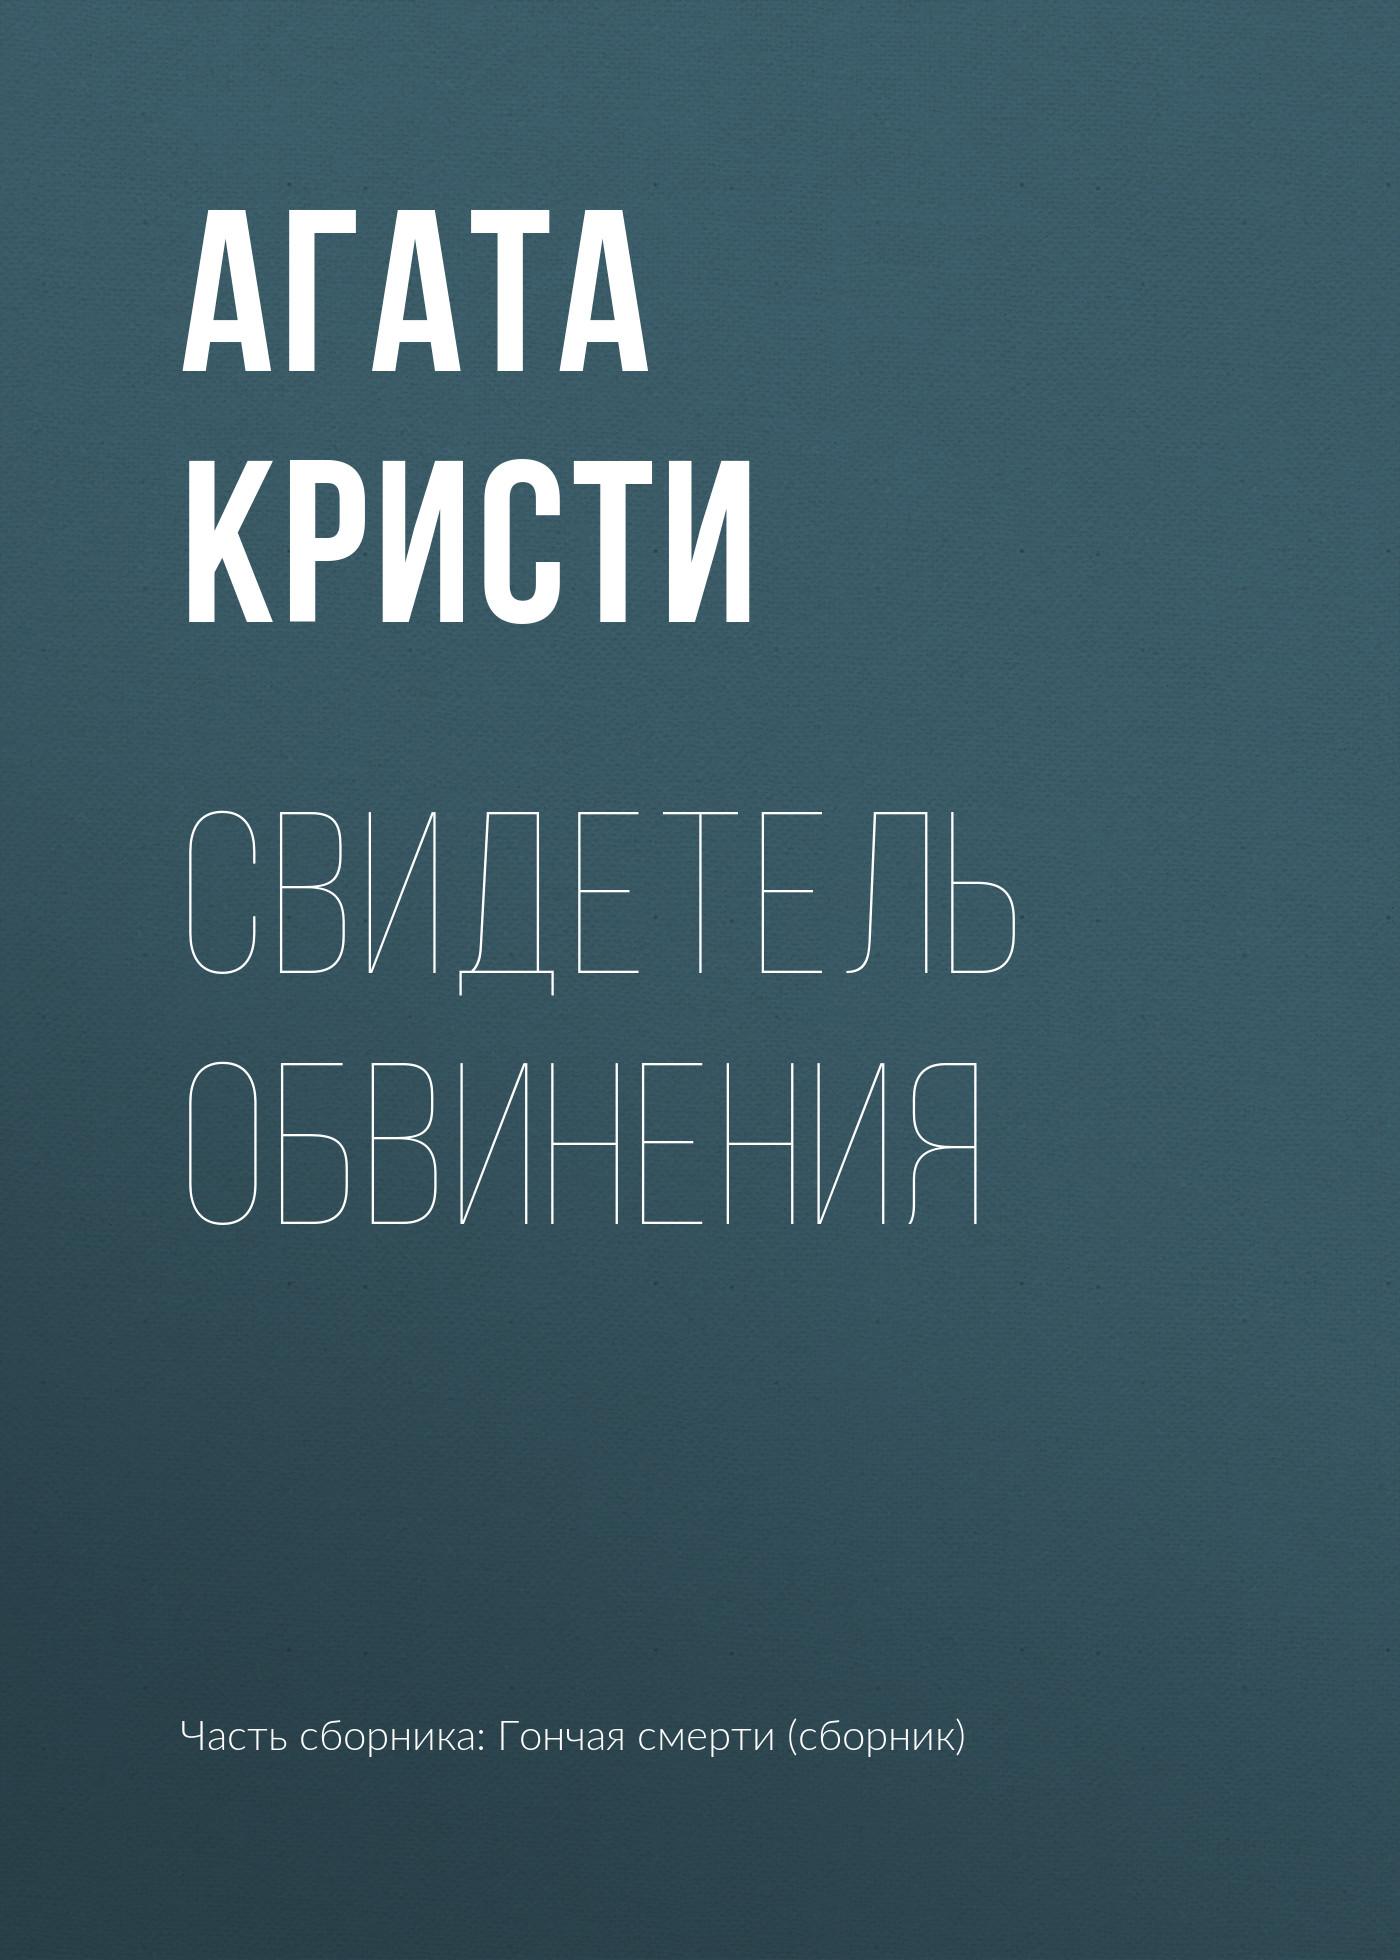 Агата Кристи Свидетель обвинения свидетель обвинения 2018 09 22t19 00